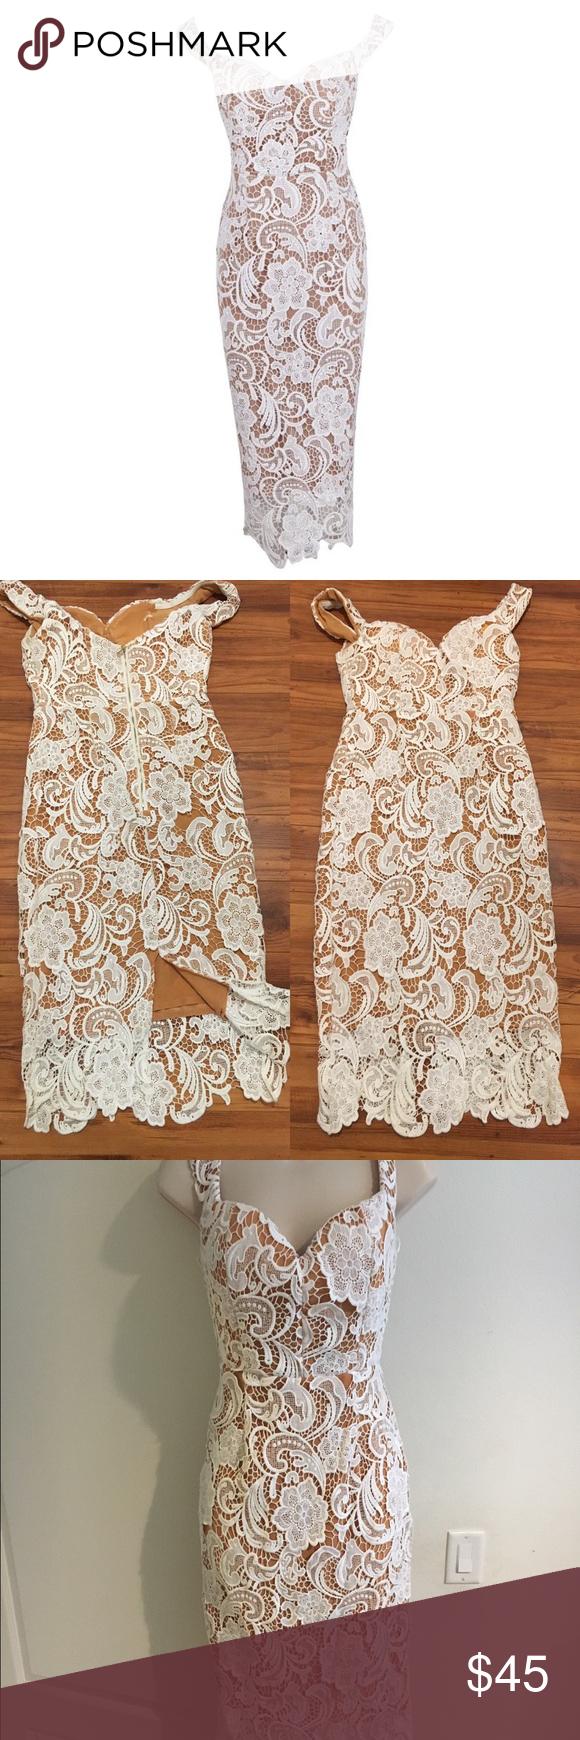 Beautiful Tan Lace Dress Tan Lace Dress Lace Dress Beautiful Tan [ 1740 x 580 Pixel ]